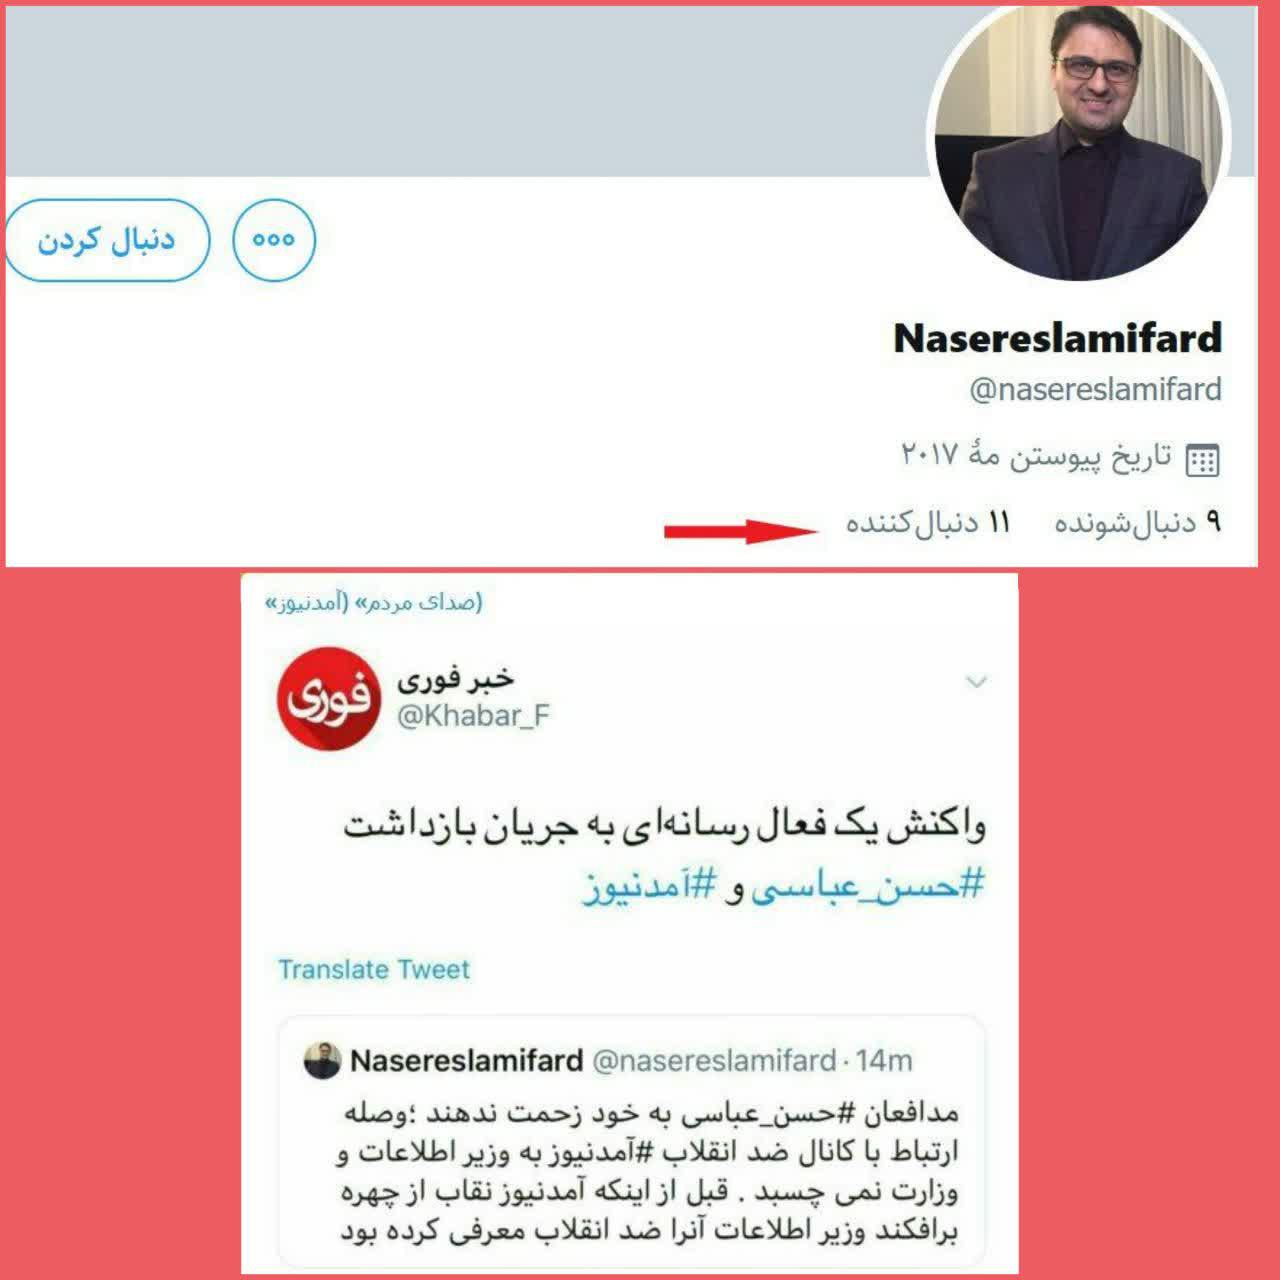 eslamifard%20%281%29 یک حساب گمنام جديد و تو و تازه تاسیس توئیت میکند، آمدنیوز انعکاس میدهد